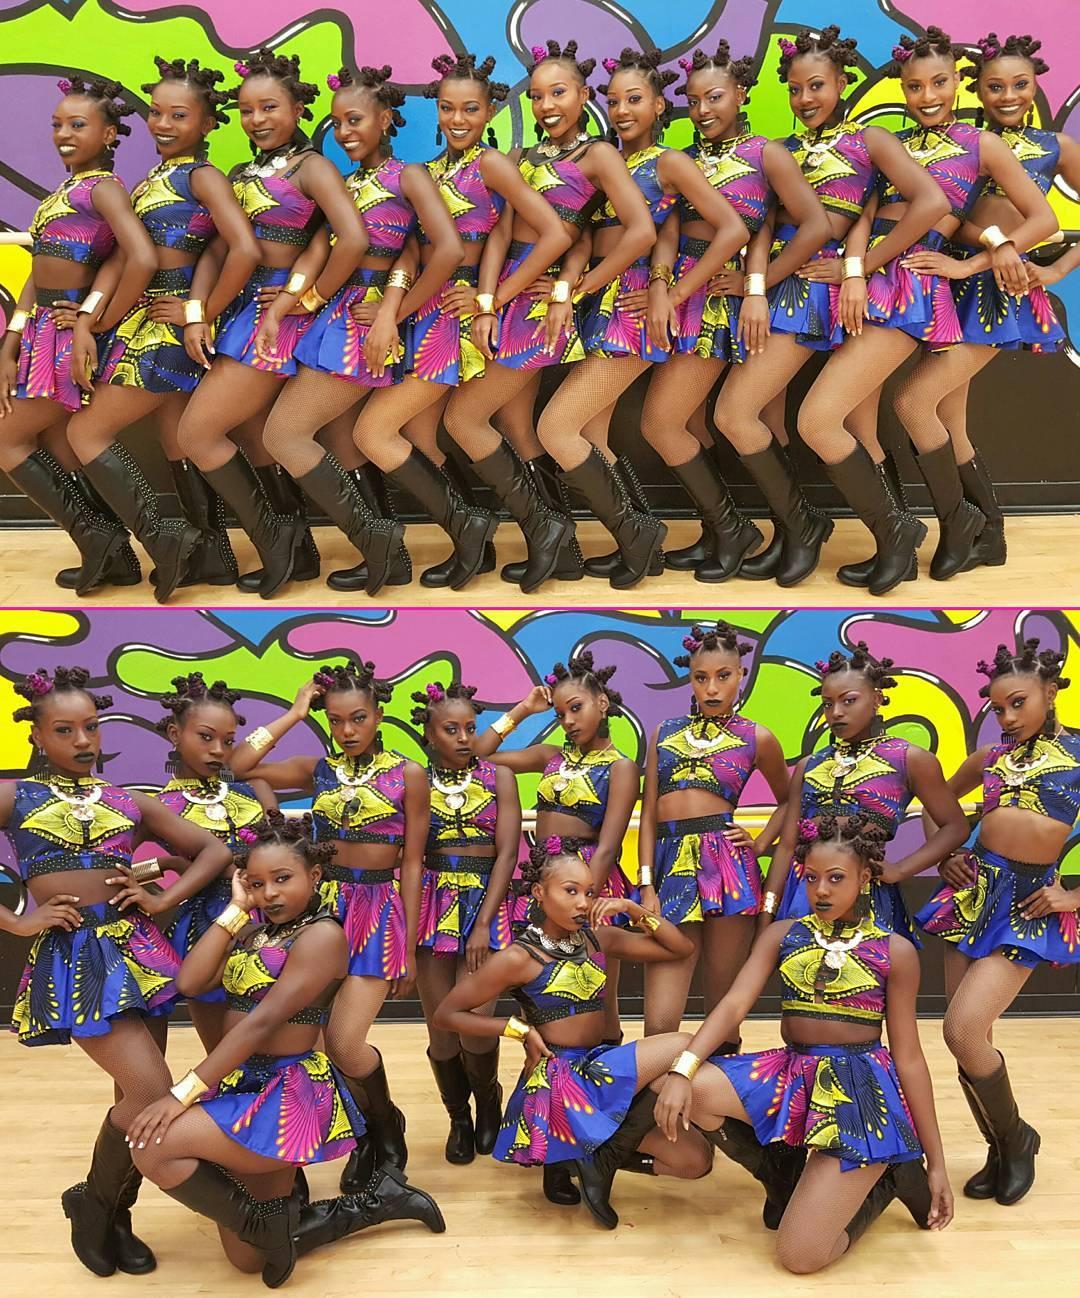 dance-mnw-ggirls-at-miami-northwestern-high-school-vs-central-high-school-football-game